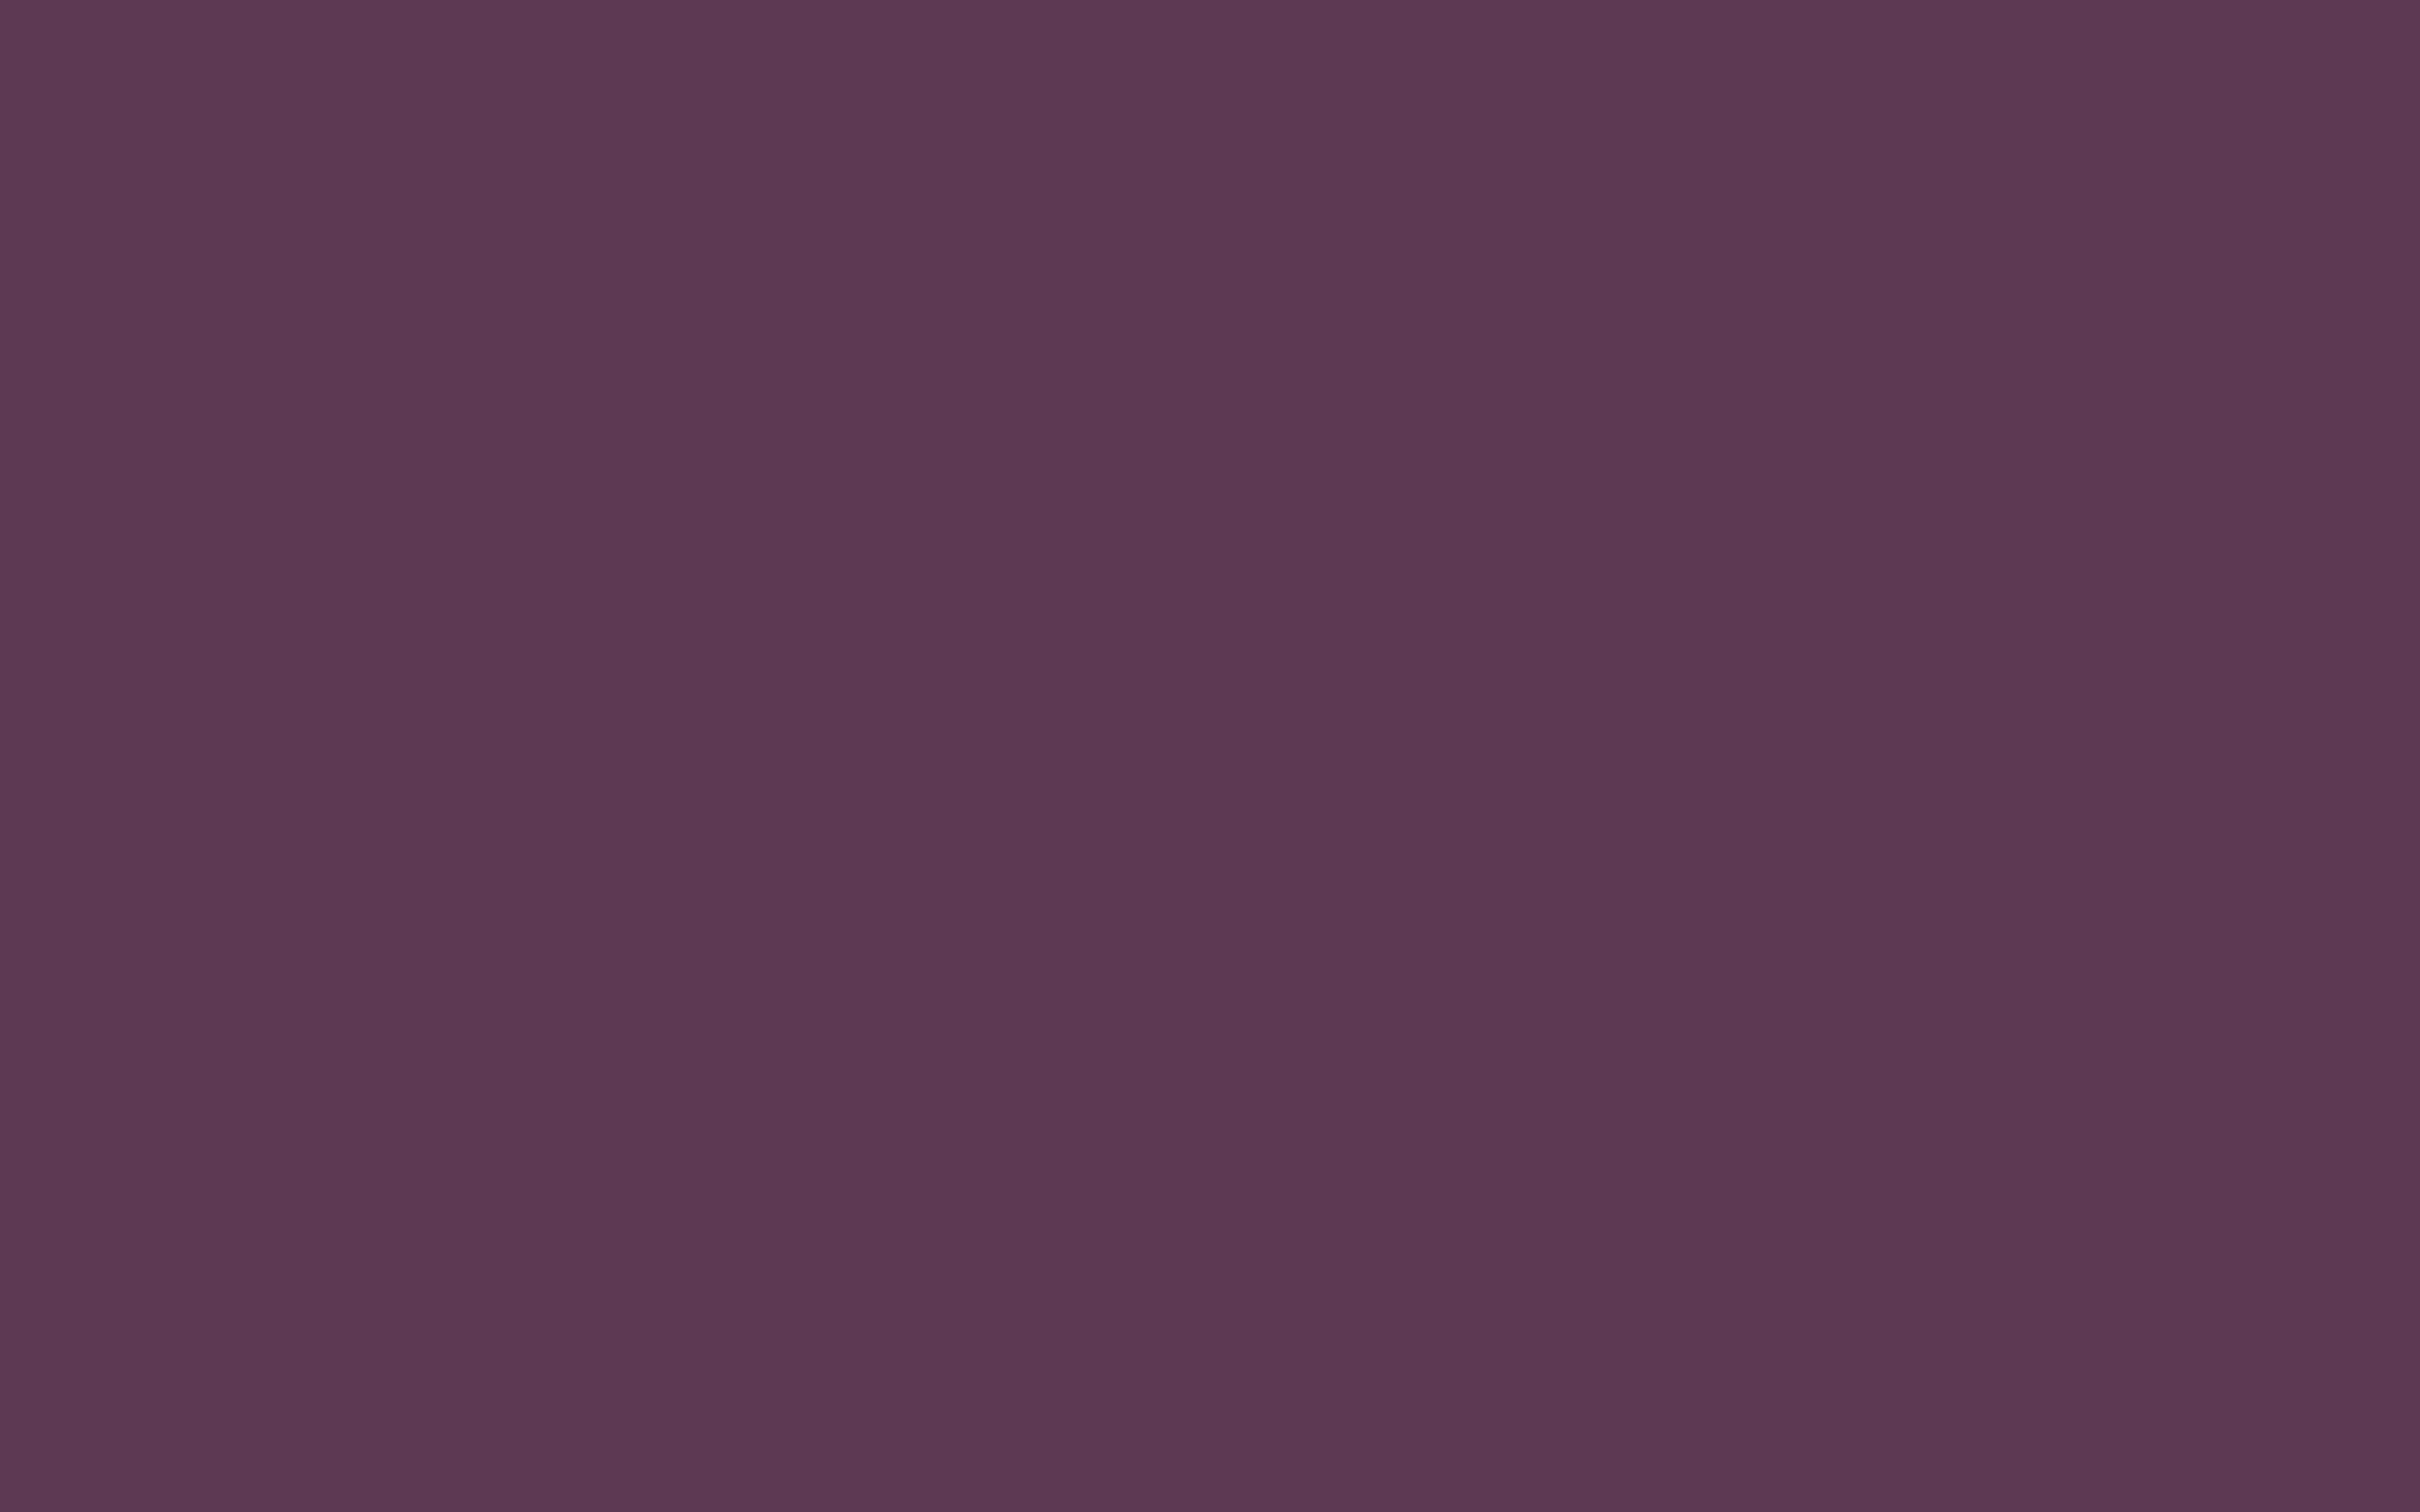 2560x1600 Dark Byzantium Solid Color Background